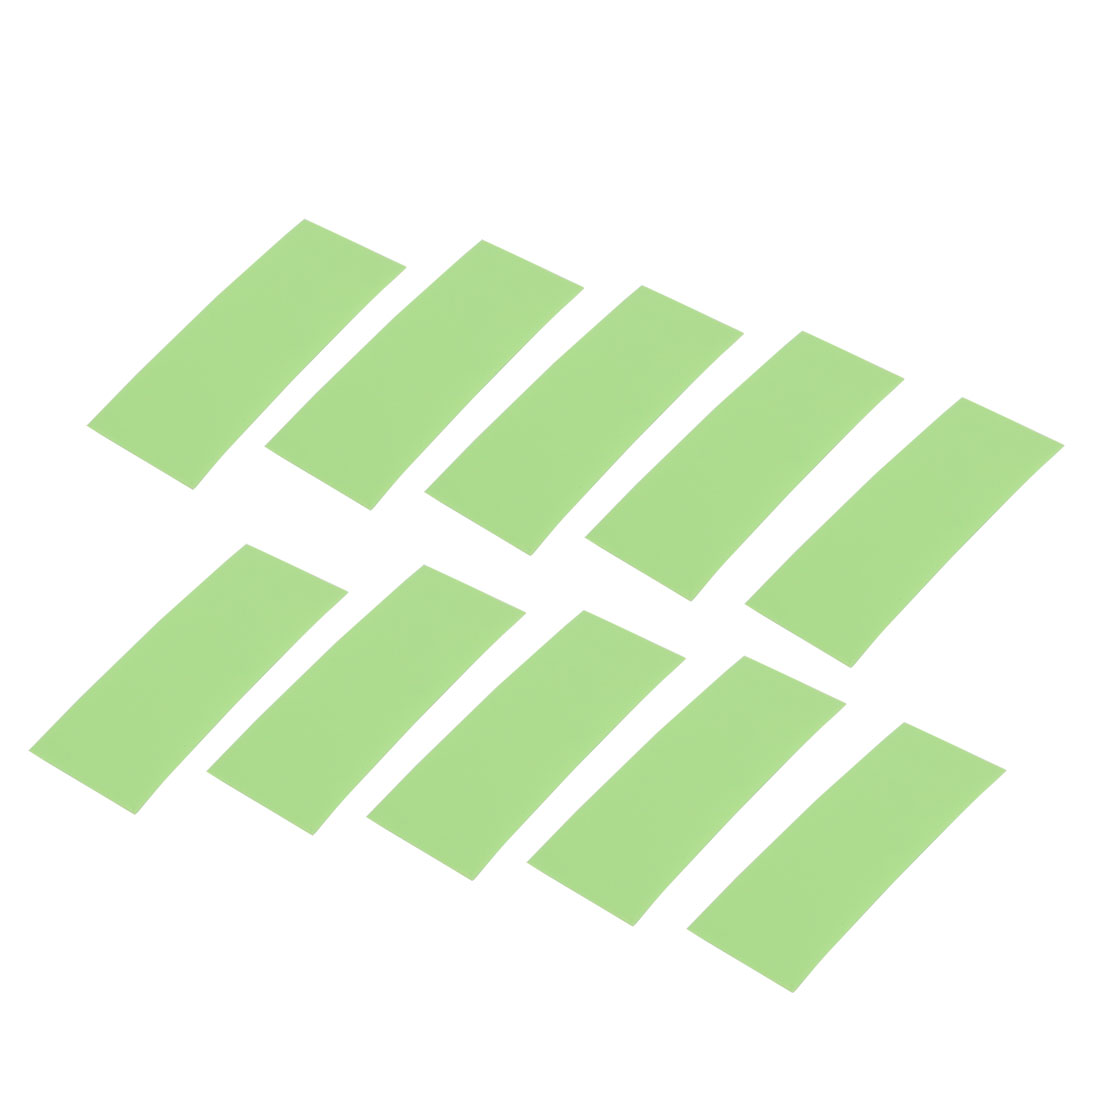 10pcs 17mm Flat Width 46mm Long Heat Shrinkable Tube Light Green for AAA Battery